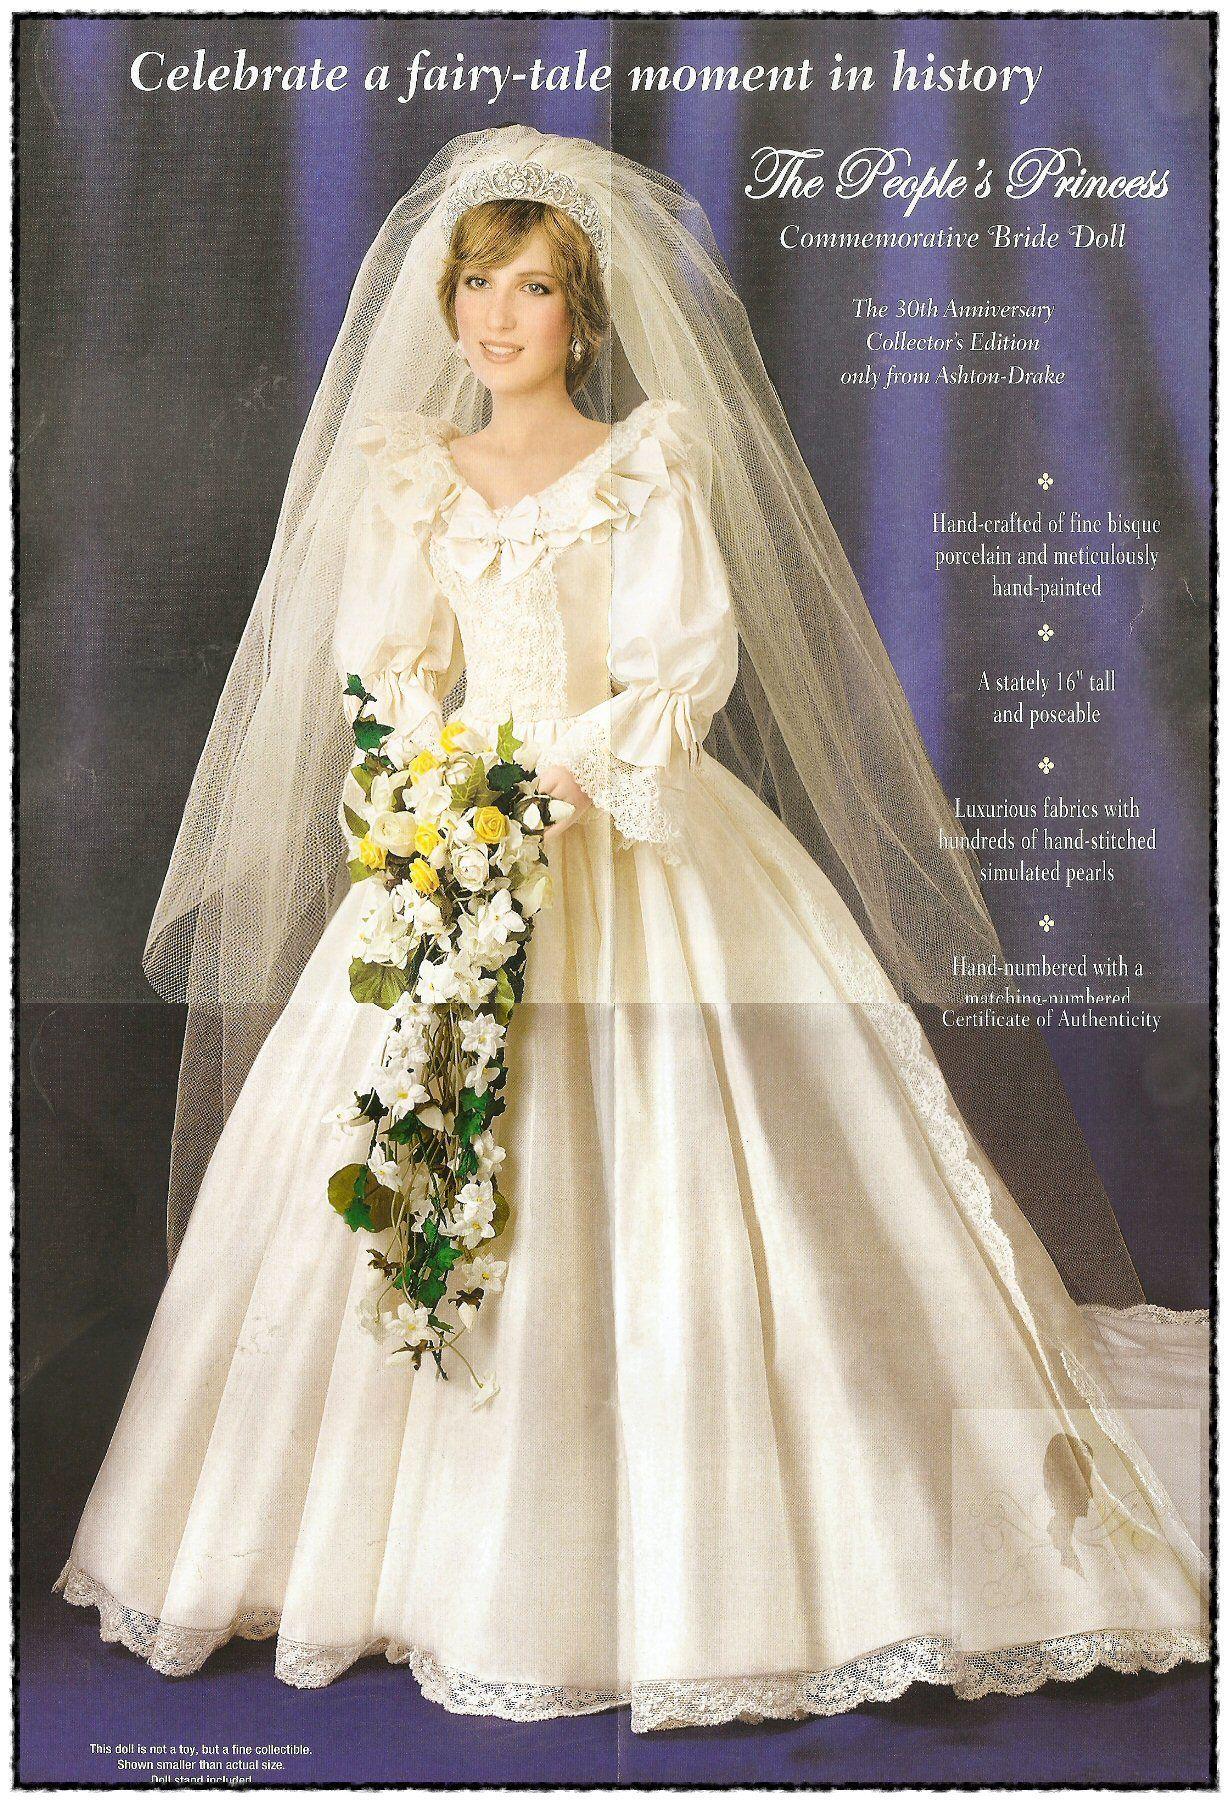 ashton drake bride dolls Google Search Bride dolls